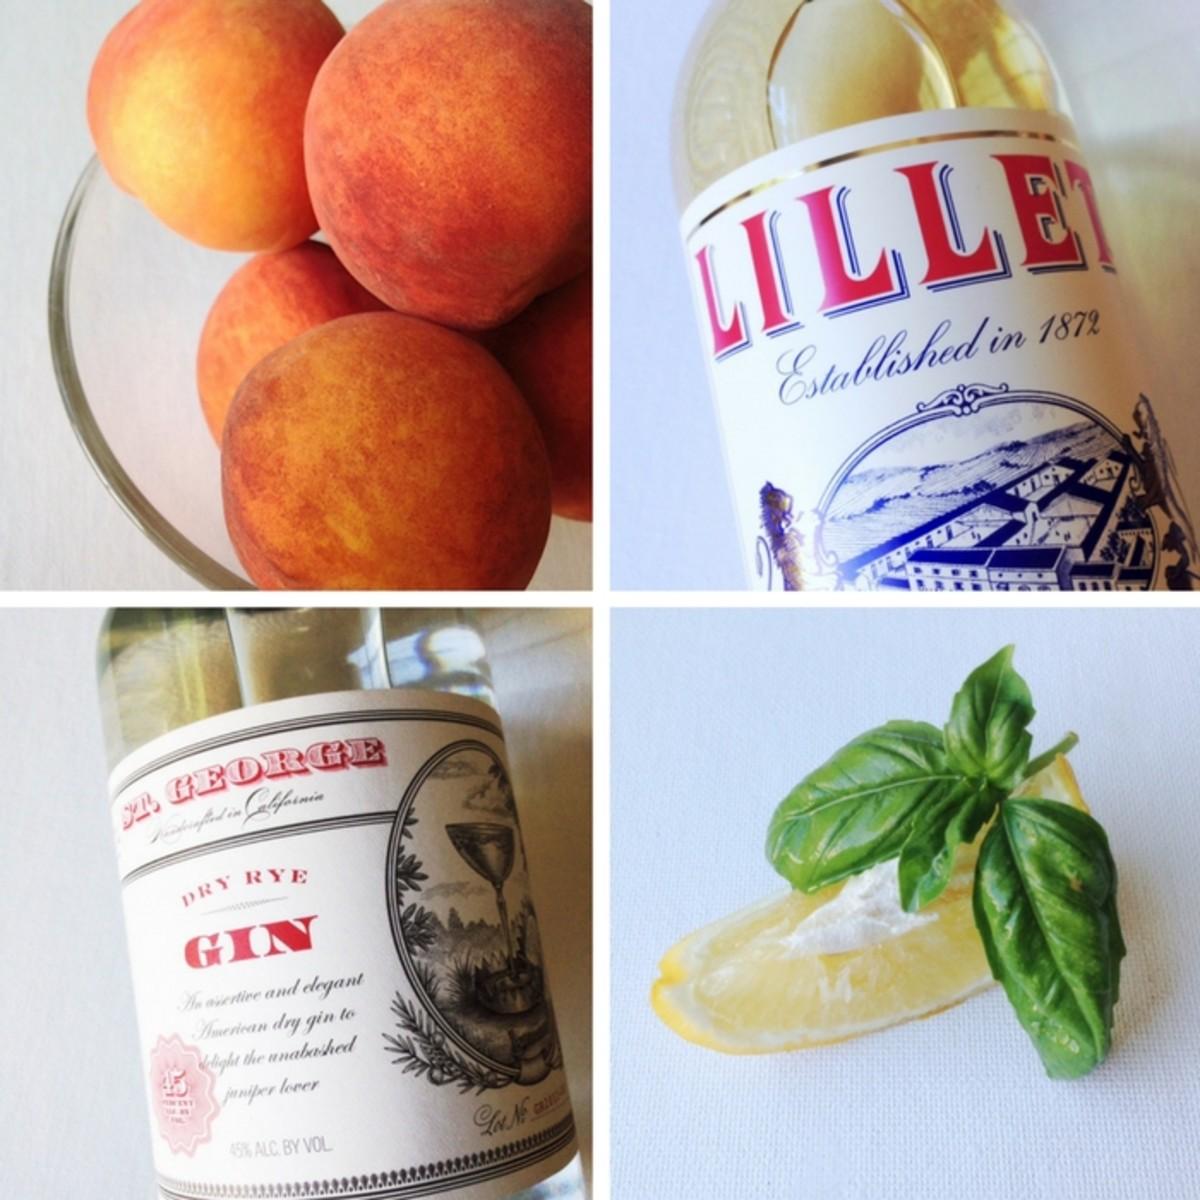 Peach cocktail ingredients